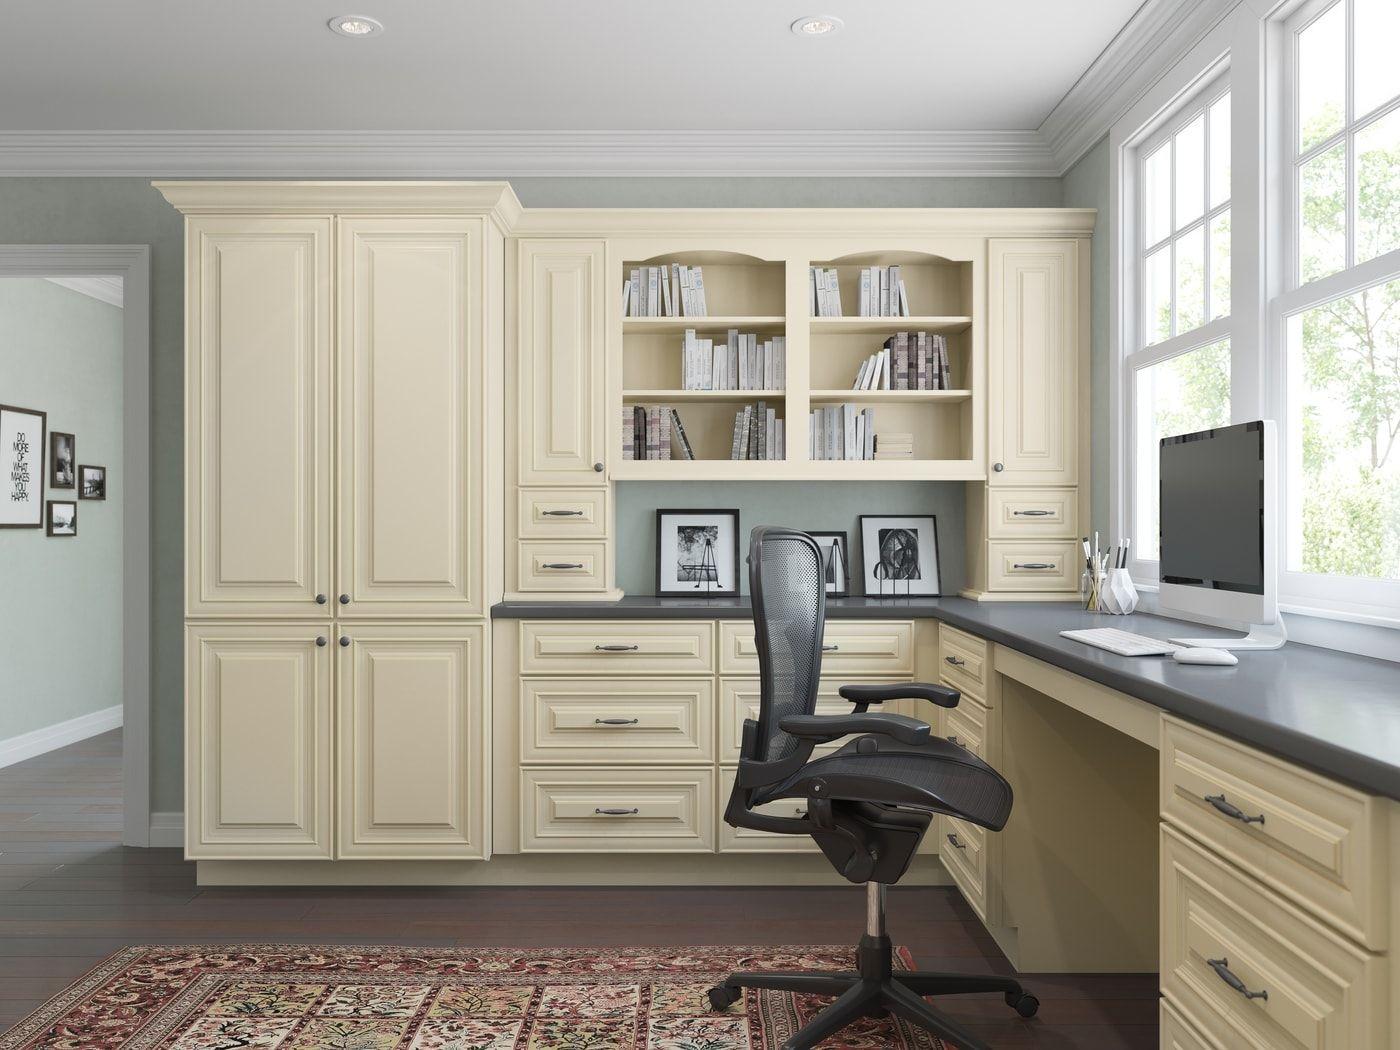 French Vanilla Glaze Ready To Assemble Office Cabinetry Office Cabinetry All Home Cabinetry Home Office Cabinets Office Cabinet Design Home Office Design